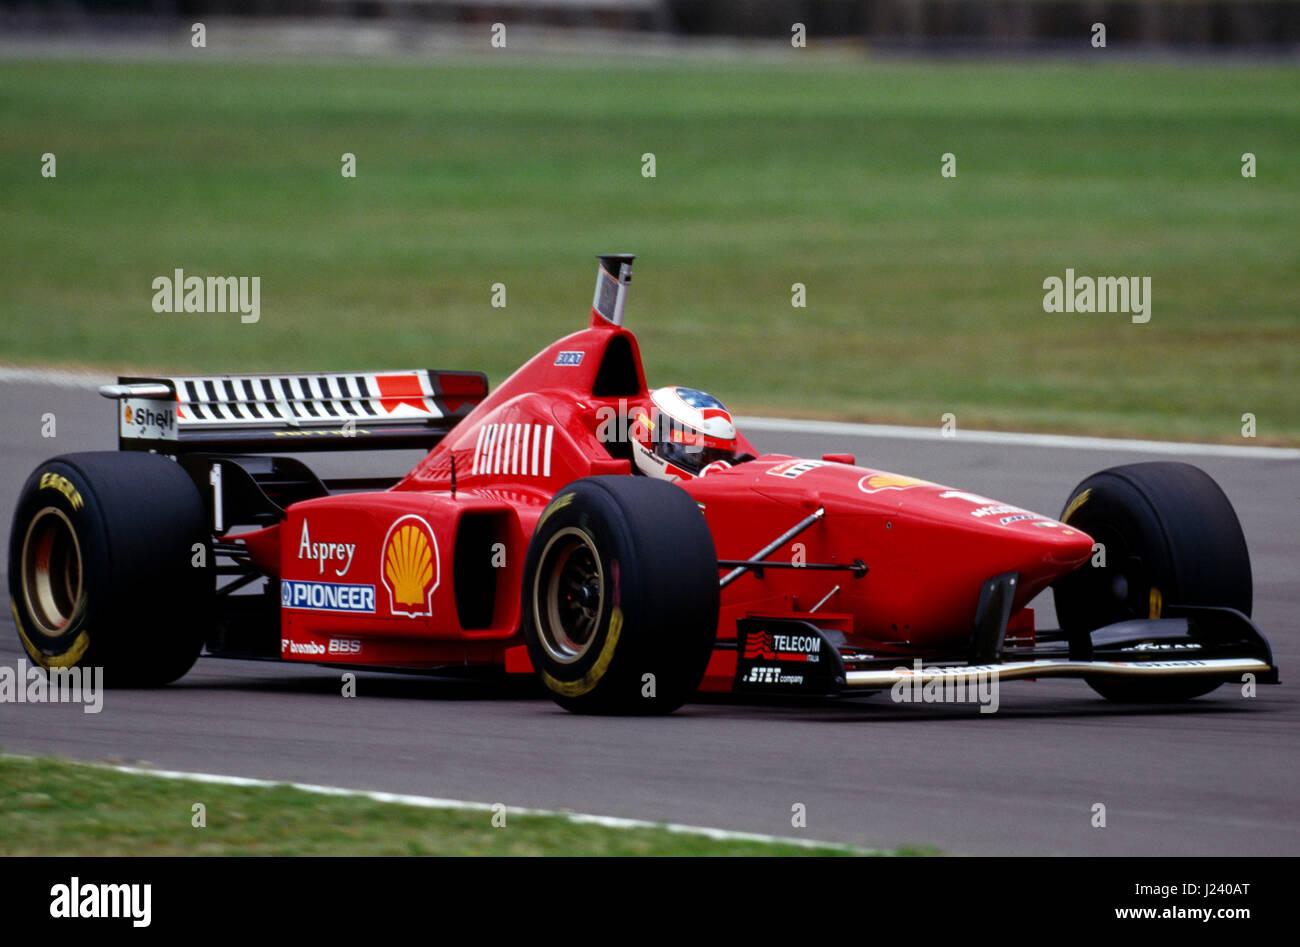 F1 Ferrari Michael Schumacher British Gp Silverstone 1996 Stockfotografie Alamy